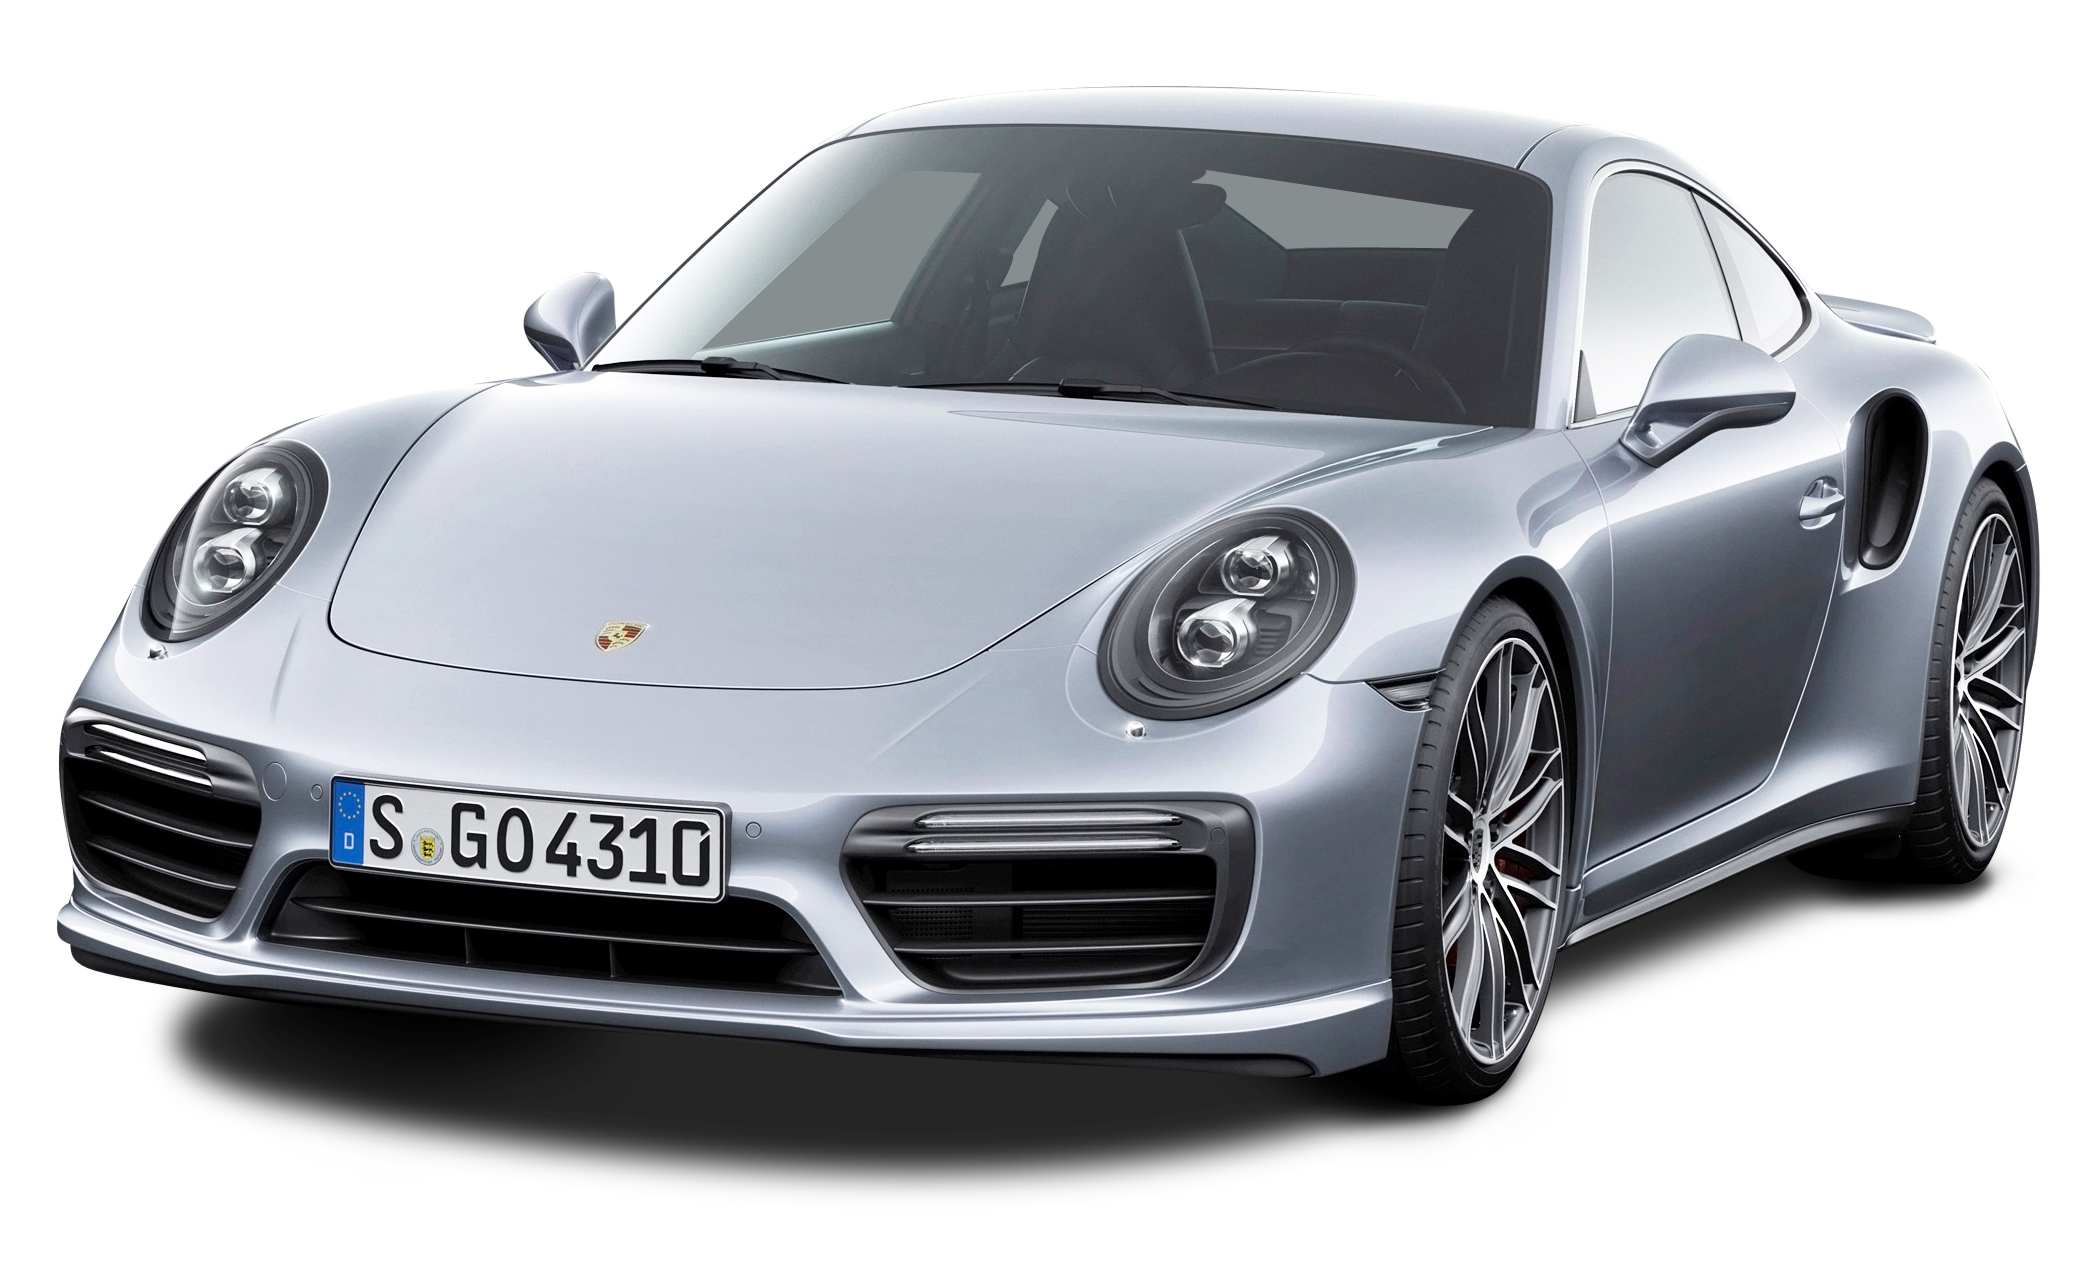 Car turbo clipart png transparent Porsche 911 Turbo Silver Car PNG Image - PurePNG | Free transparent ... png transparent